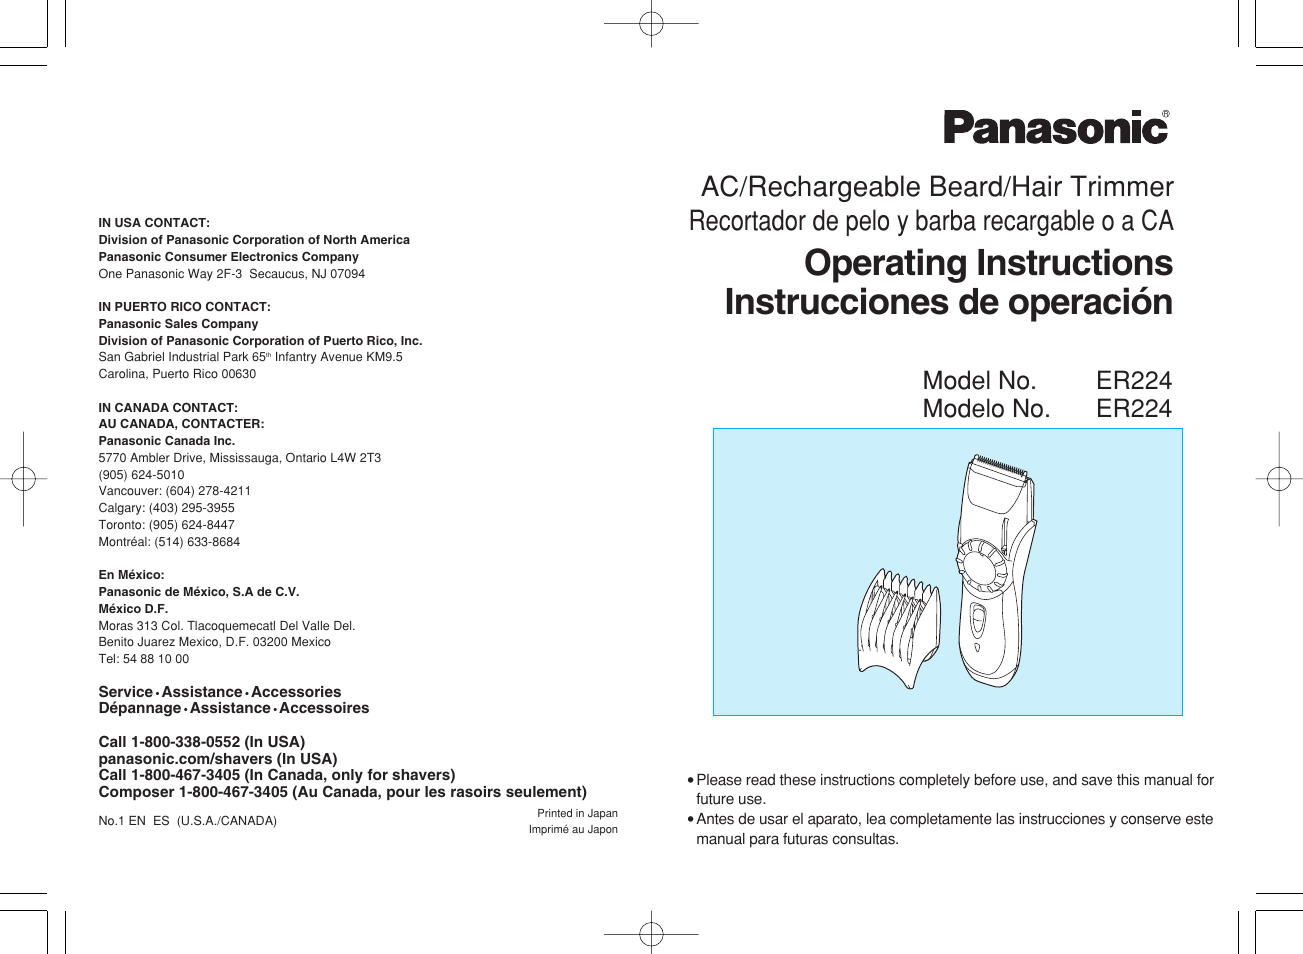 panasonic er224 user manual 10 pages rh manualsdir com panasonic canada manuals Panasonic TV Manual